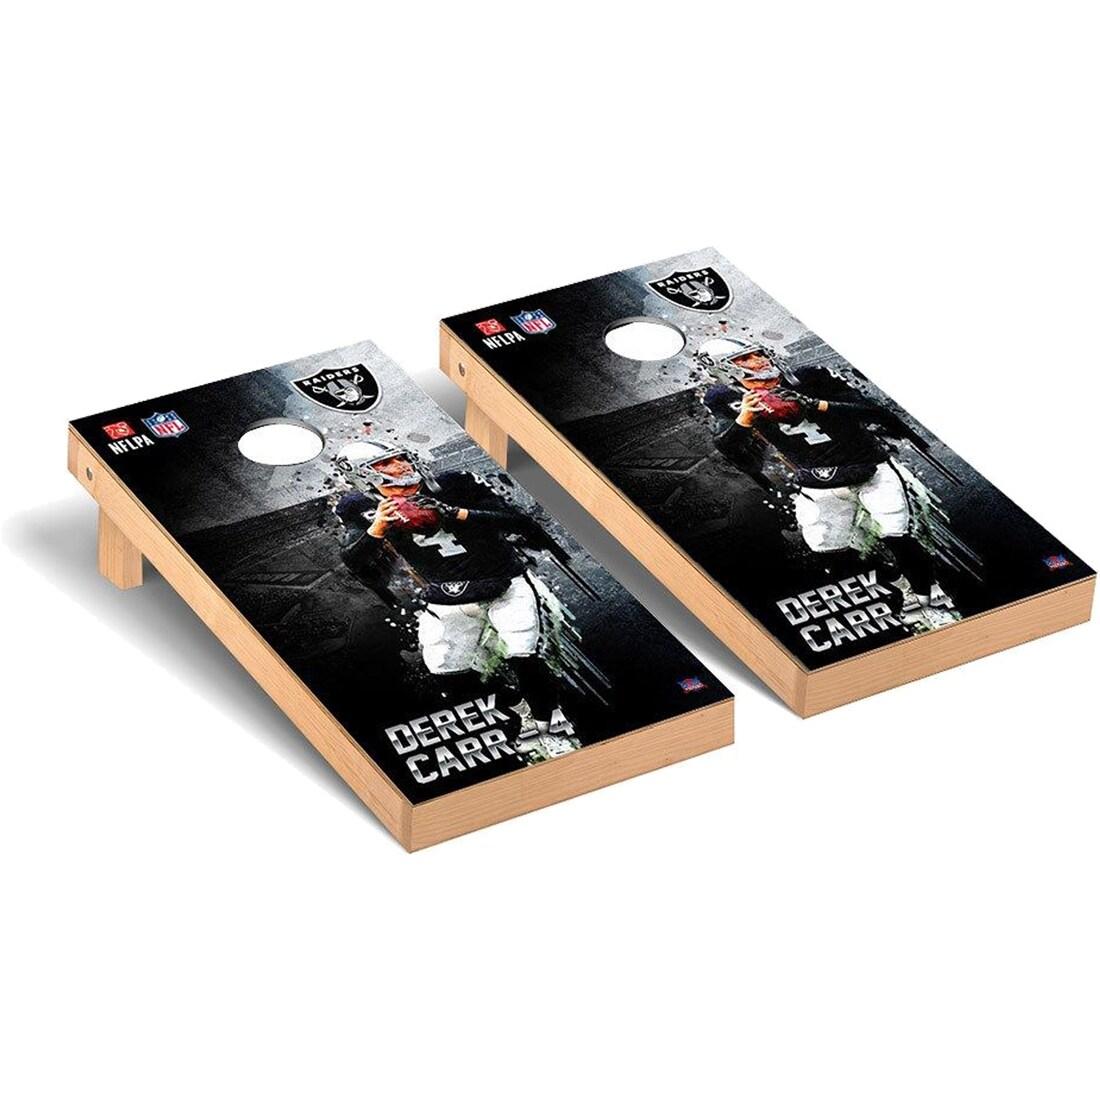 Derek Carr Las Vegas Raiders 2' x 4' NFLPA Player Cornhole Board Tailgate Toss Set